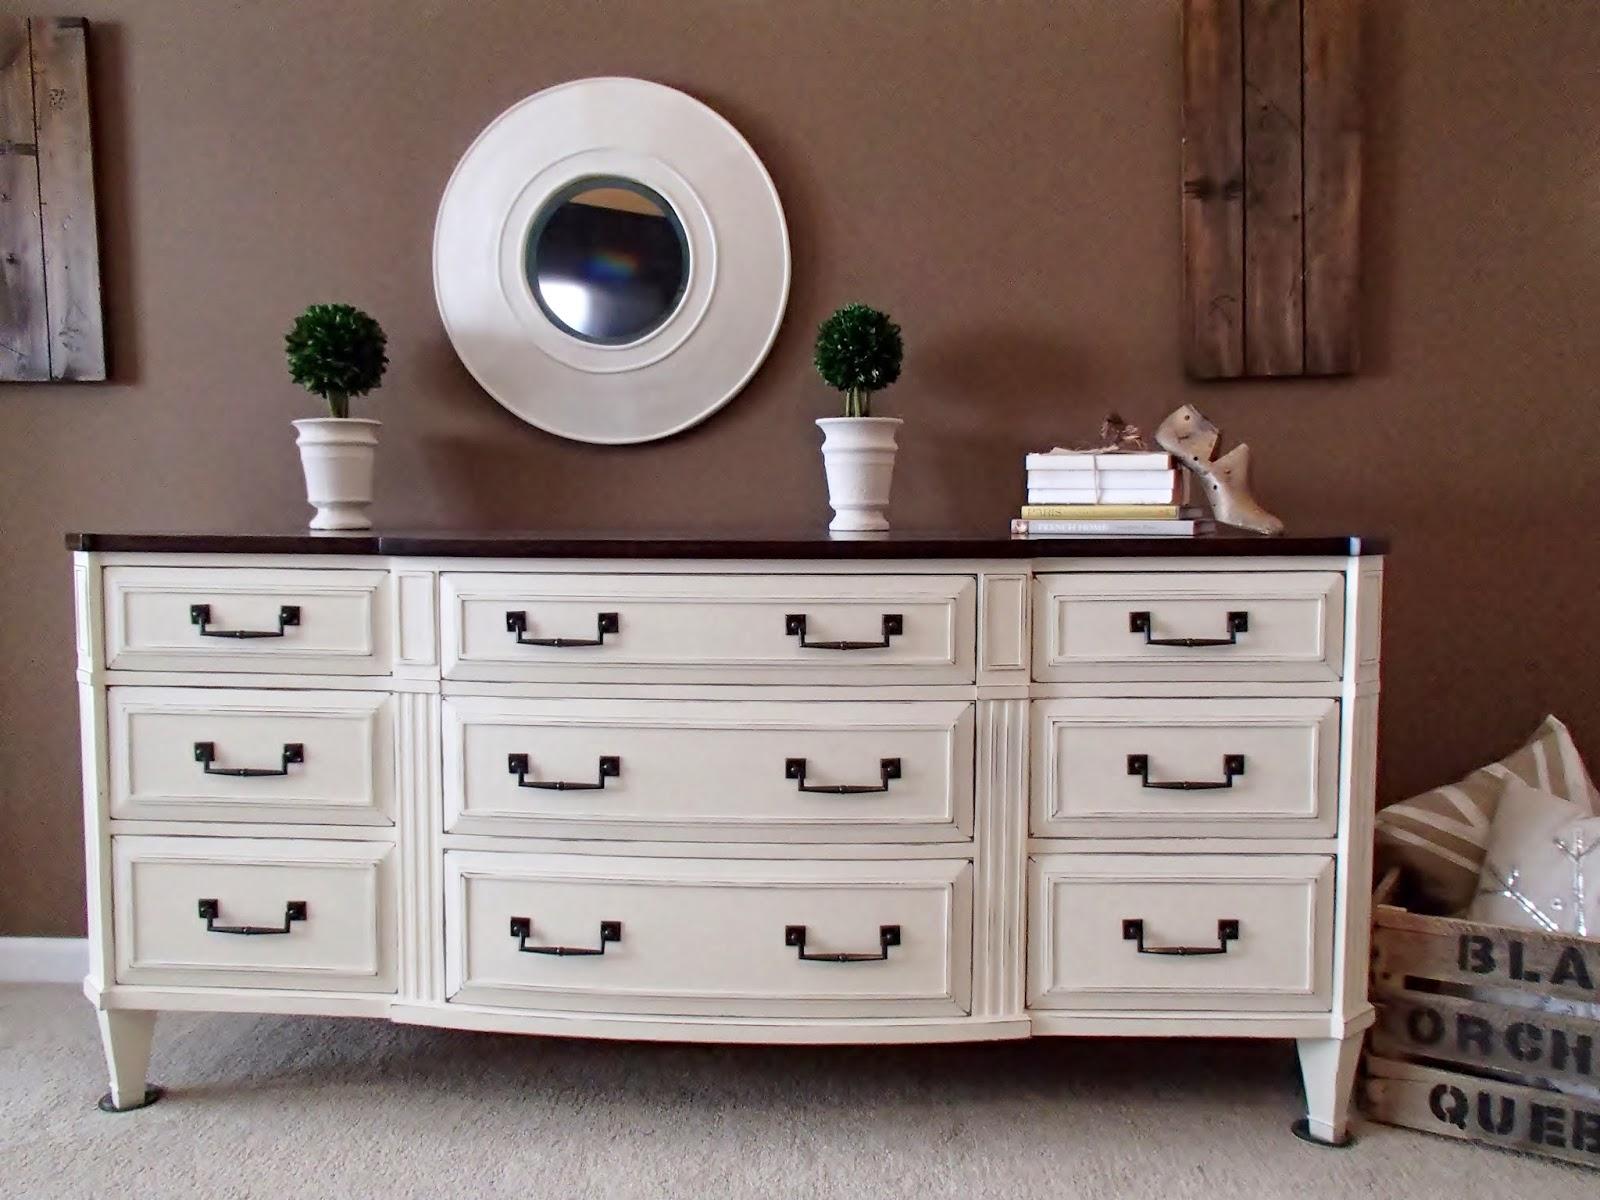 Merveilleux Mahogany Dresser In Old White